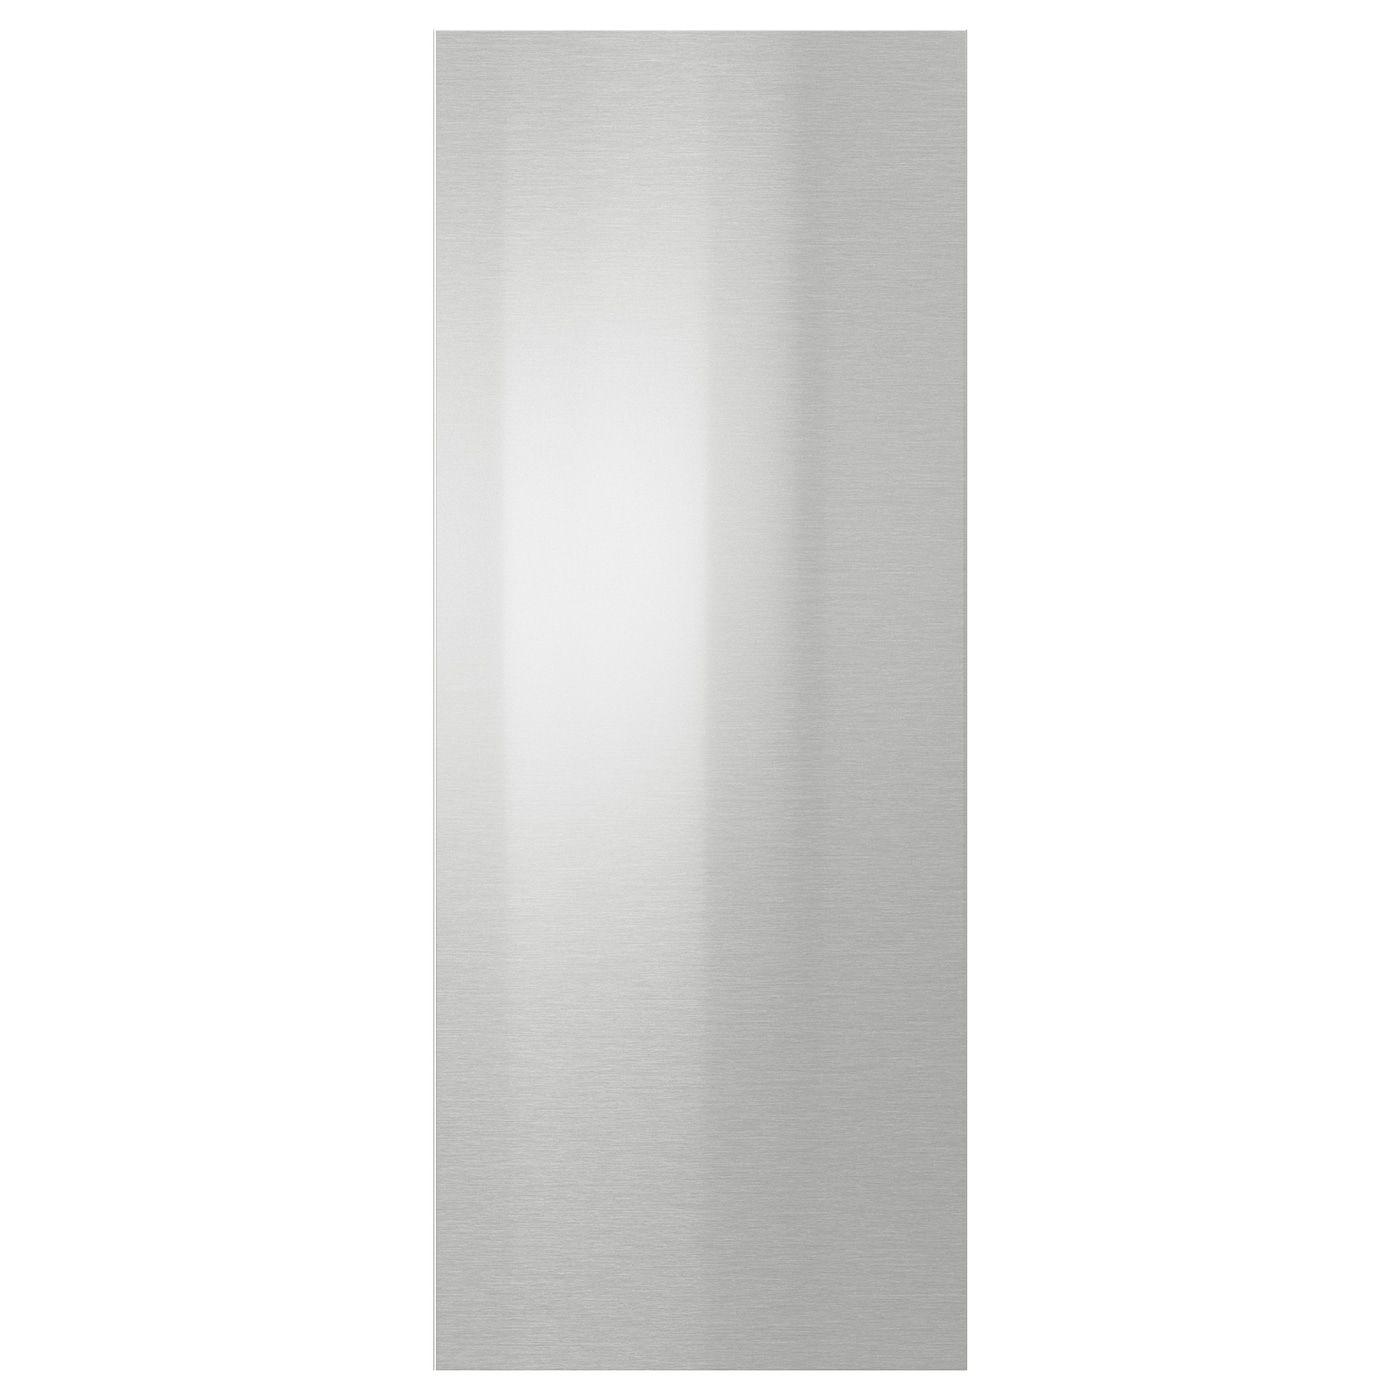 IKEA - GREVSTA Door stainless steel | Stainless steel ...